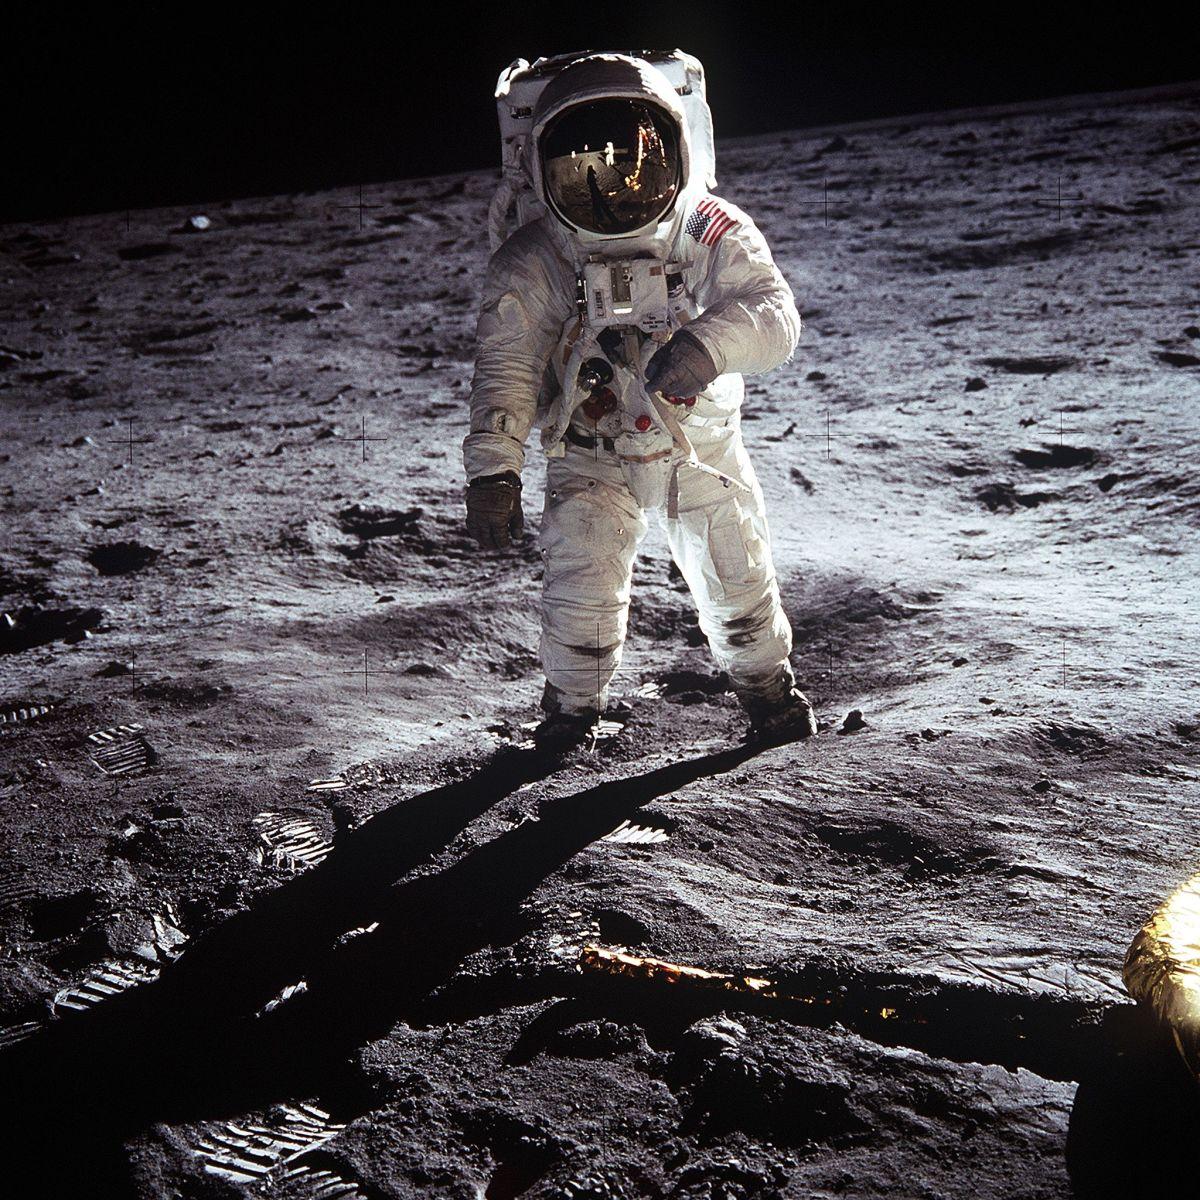 50th Anniversary of the Apollo 11 Moon Landing